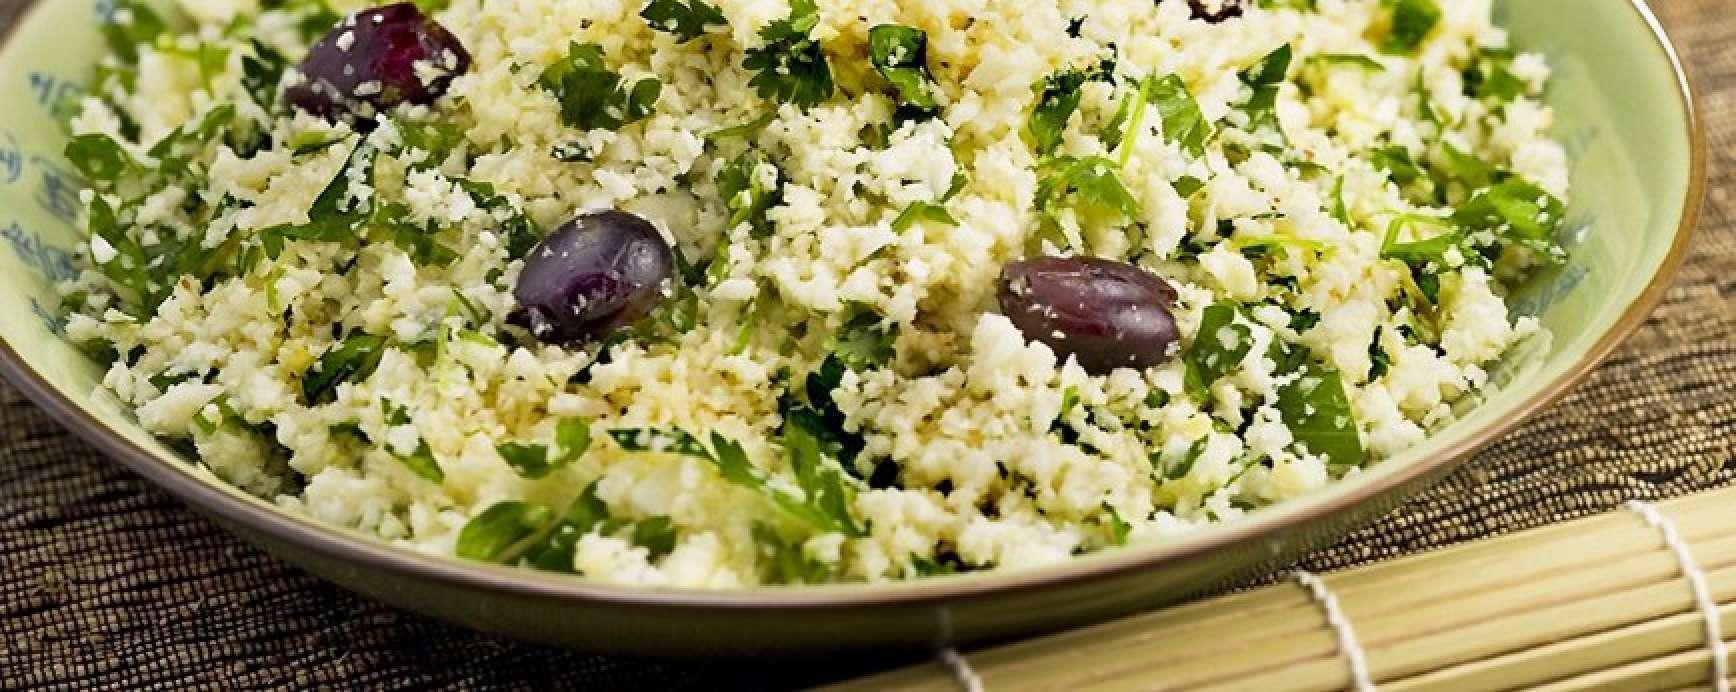 Cauliflower couscous with Okinawa Omega